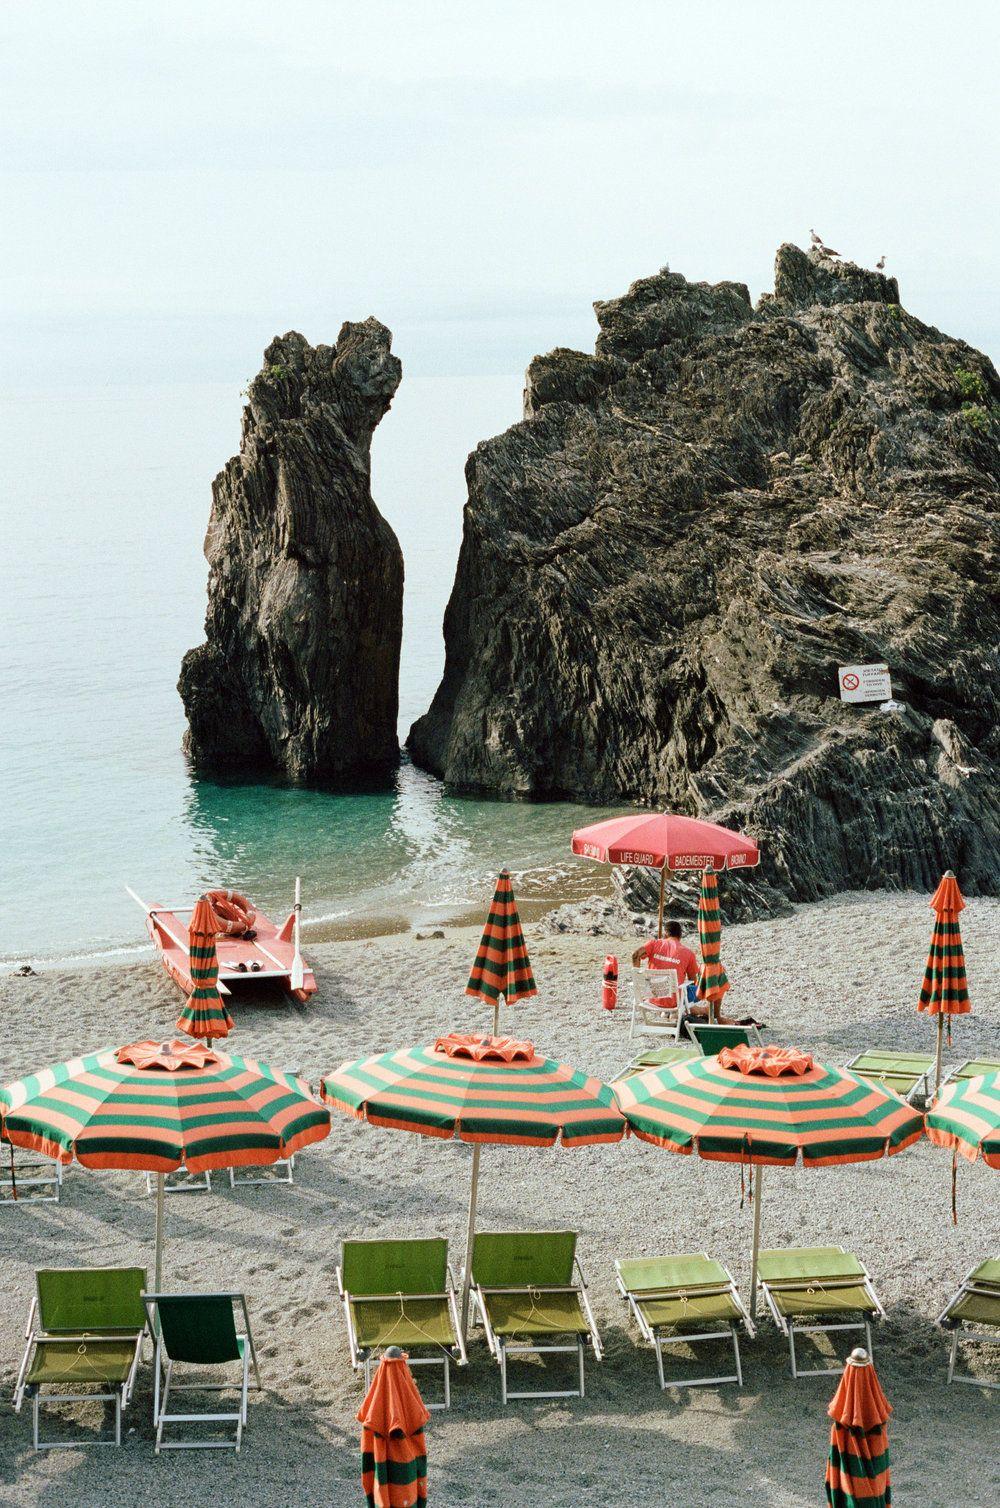 35mm film photography Cinque Terre Italy